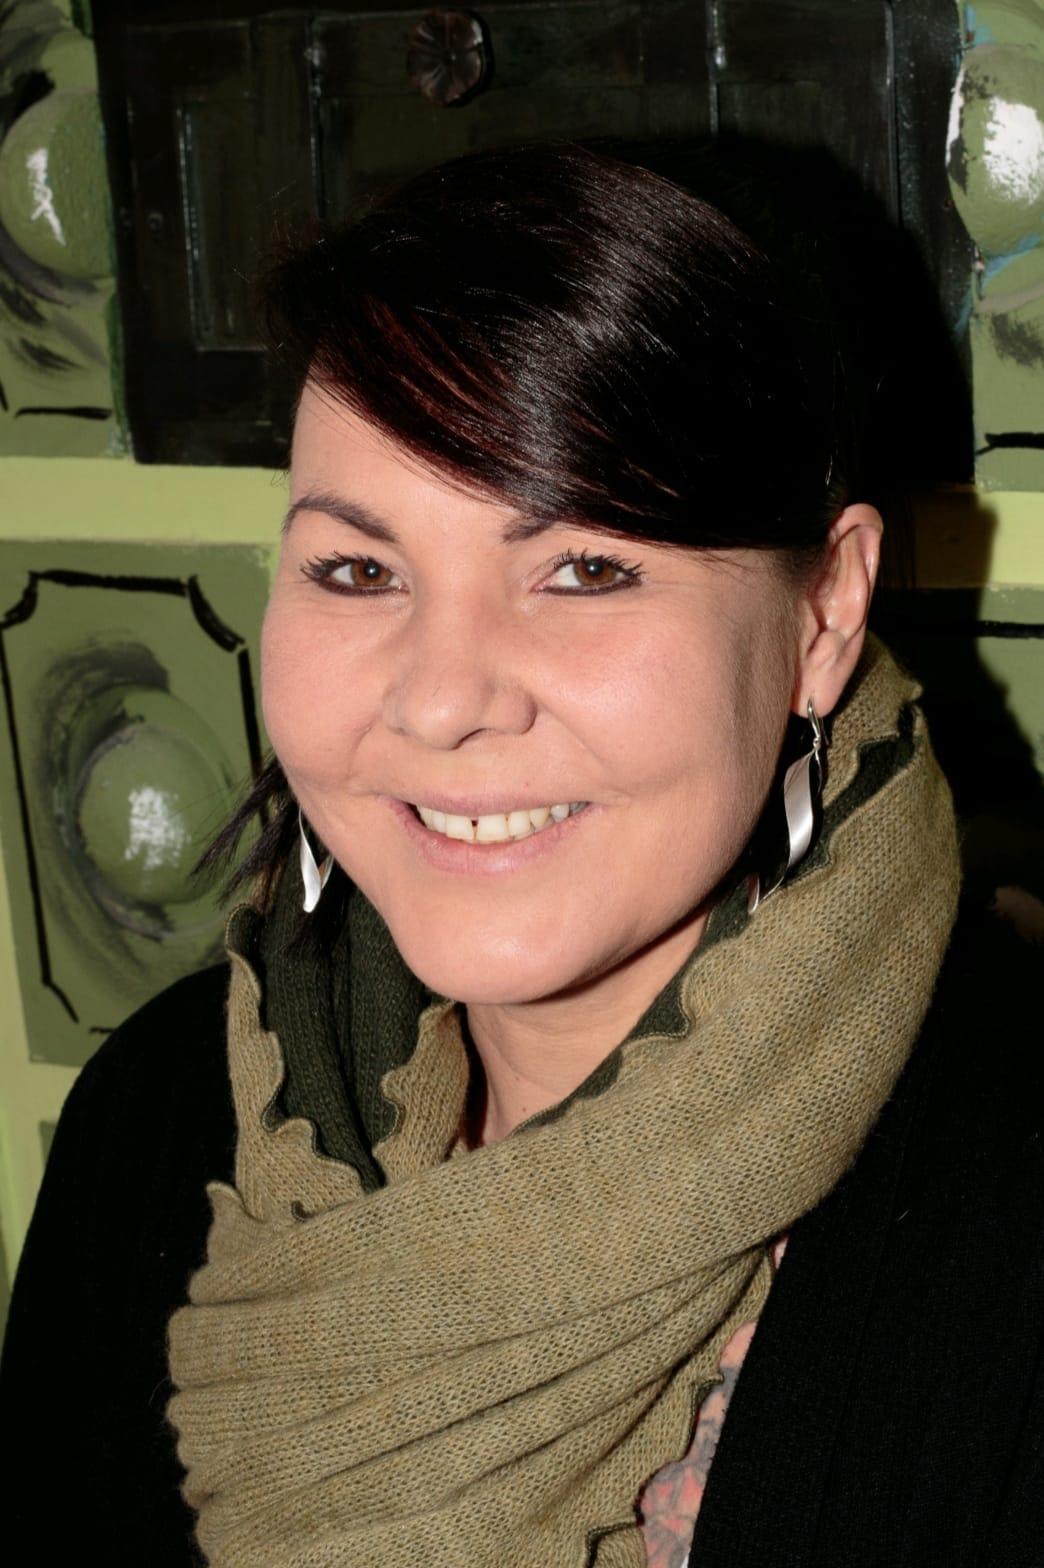 Sabine Wirtensohn